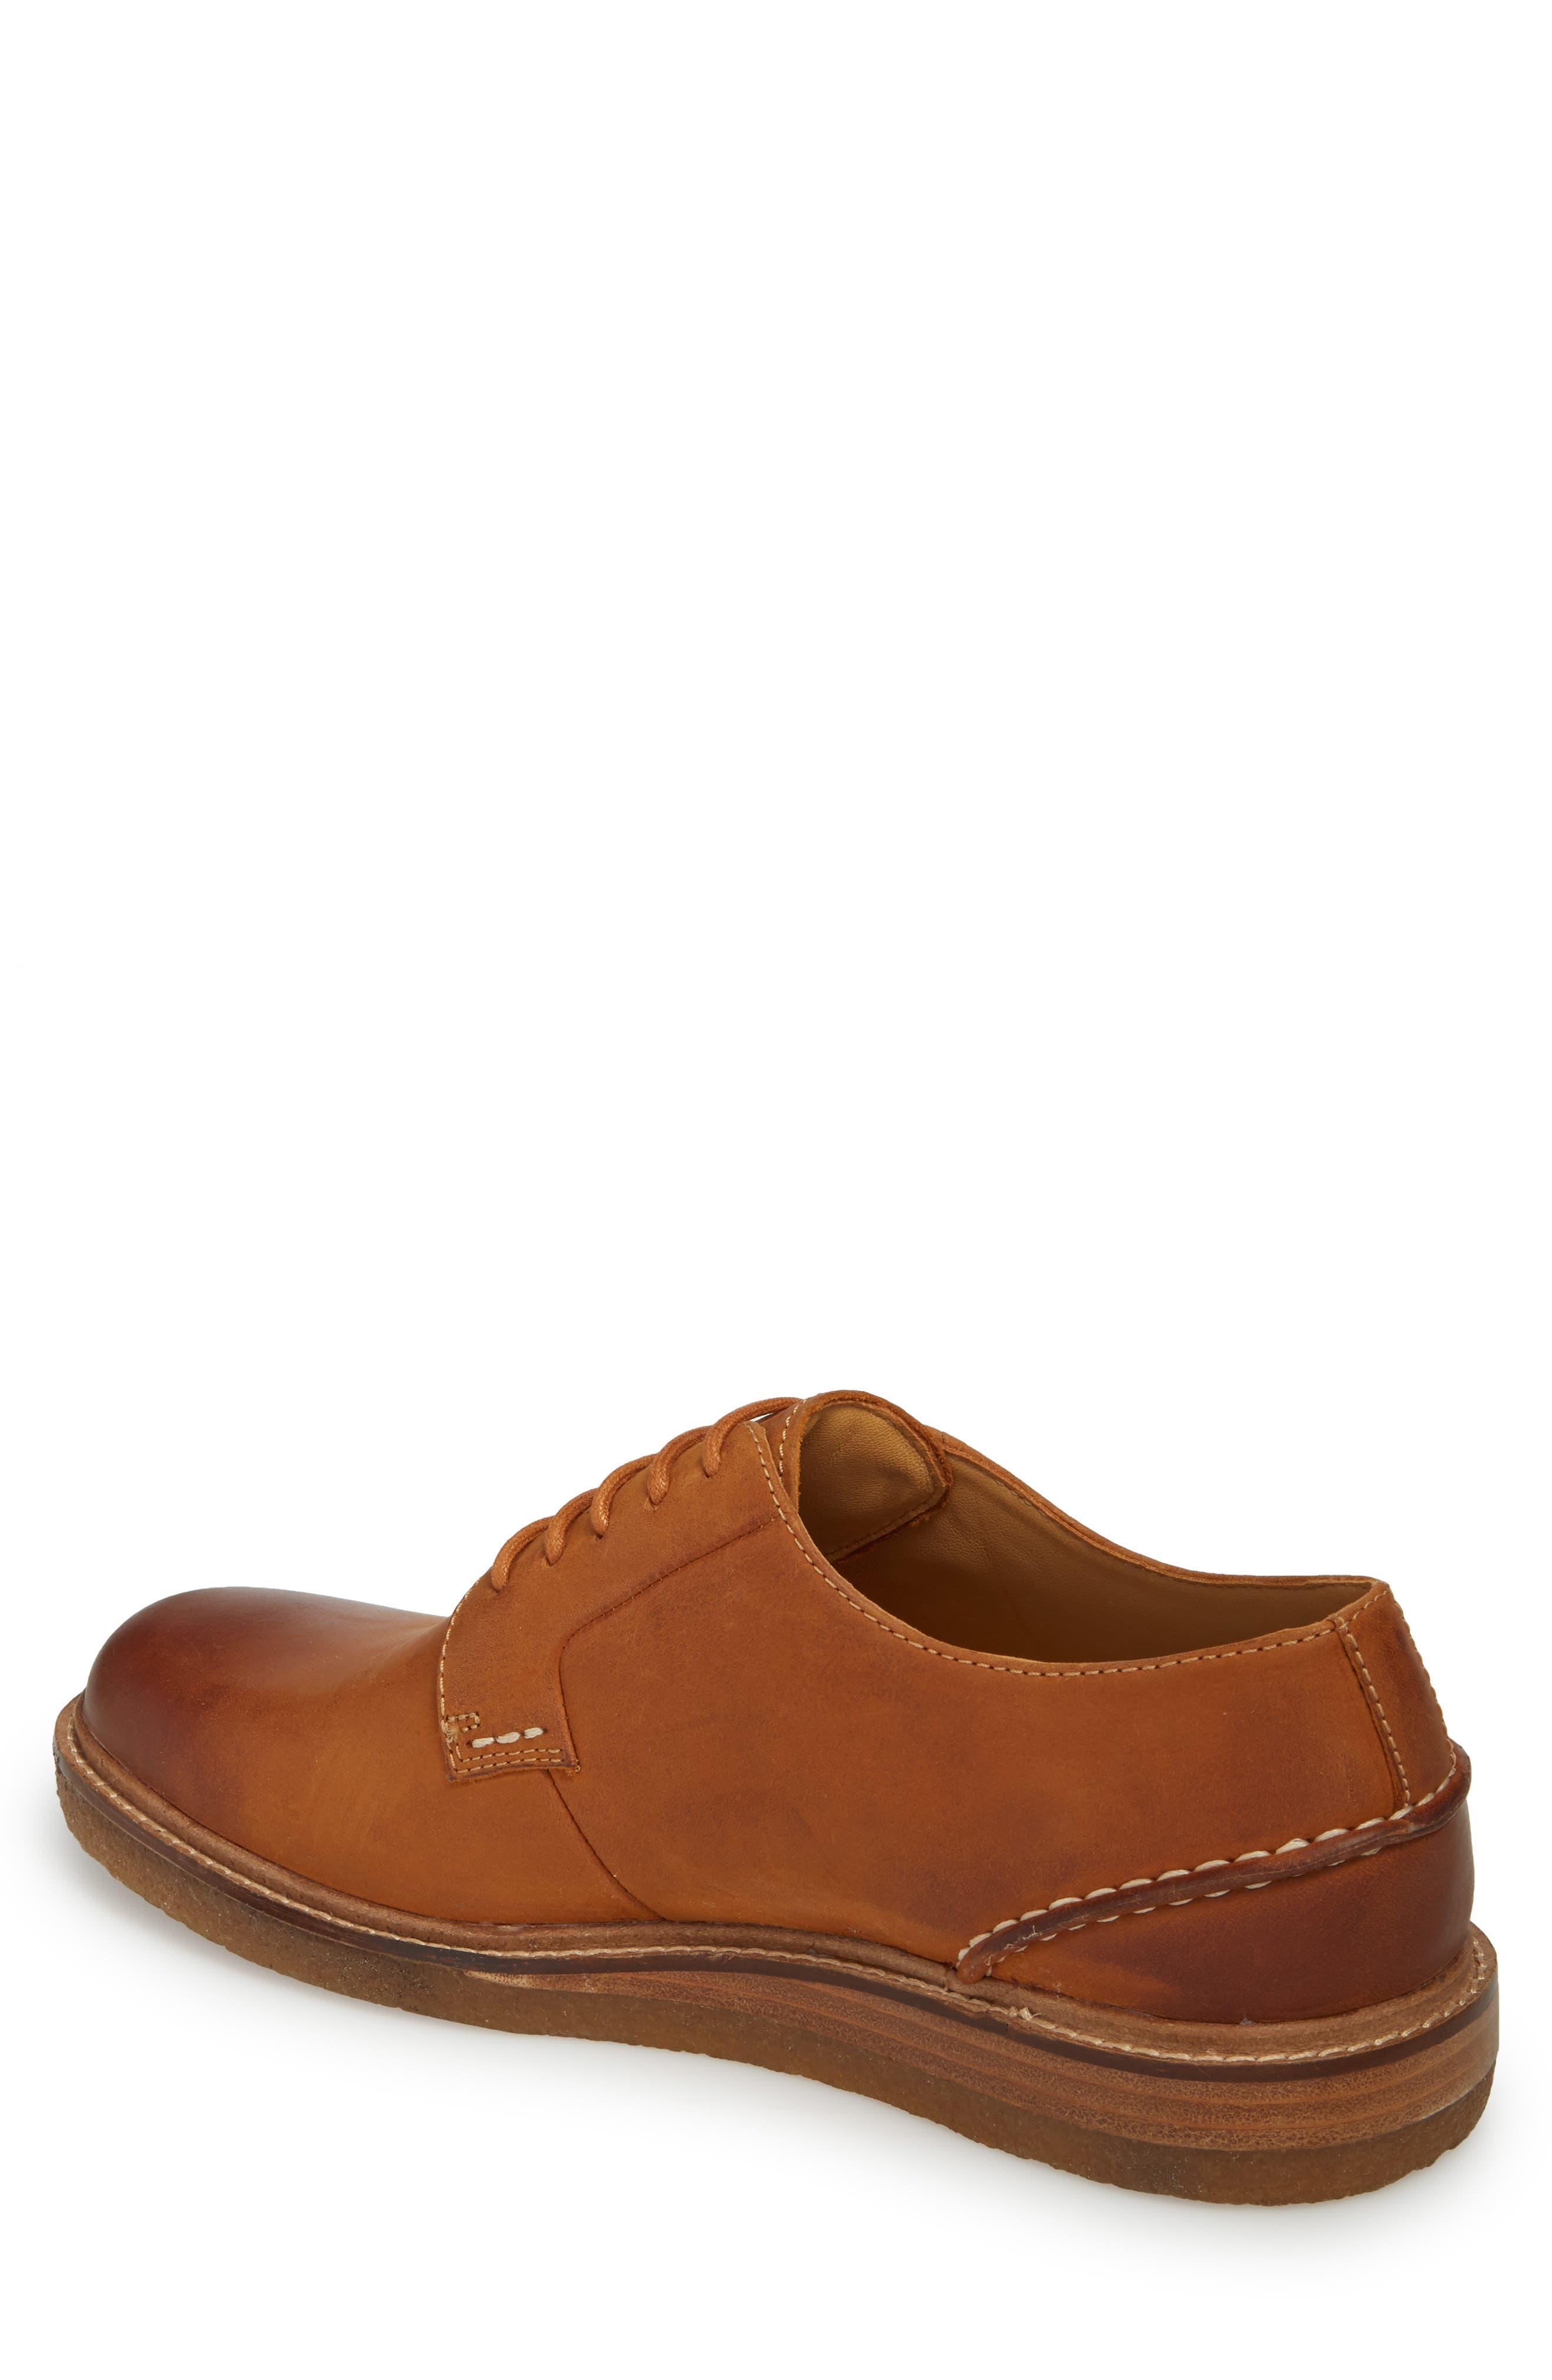 Gold Cup Plain Toe Derby,                             Alternate thumbnail 2, color,                             Tan Leather